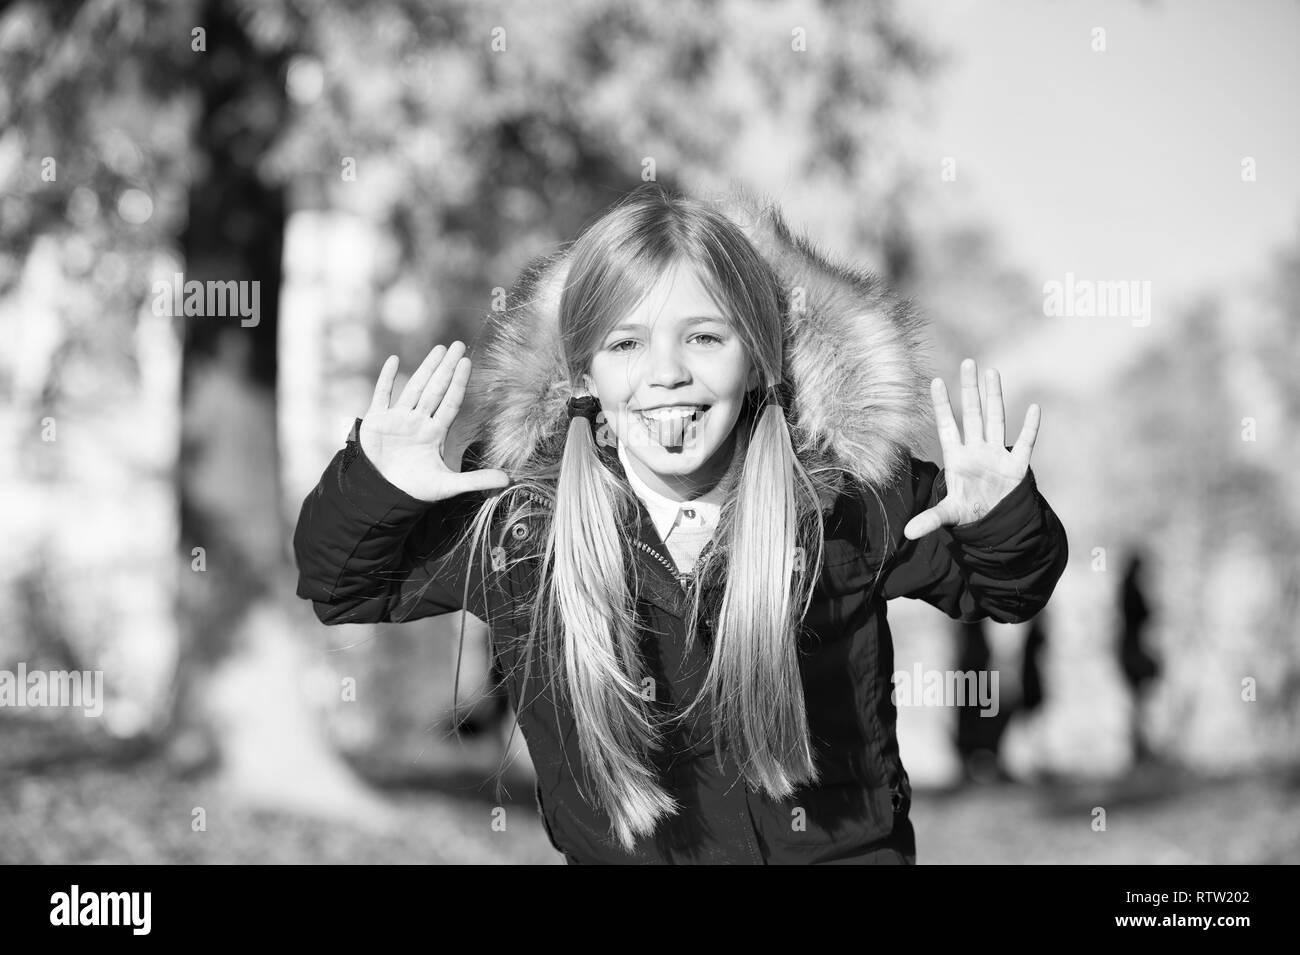 f1b196745 Girl playful grimace face in coat enjoy fall park. Playful kid ...